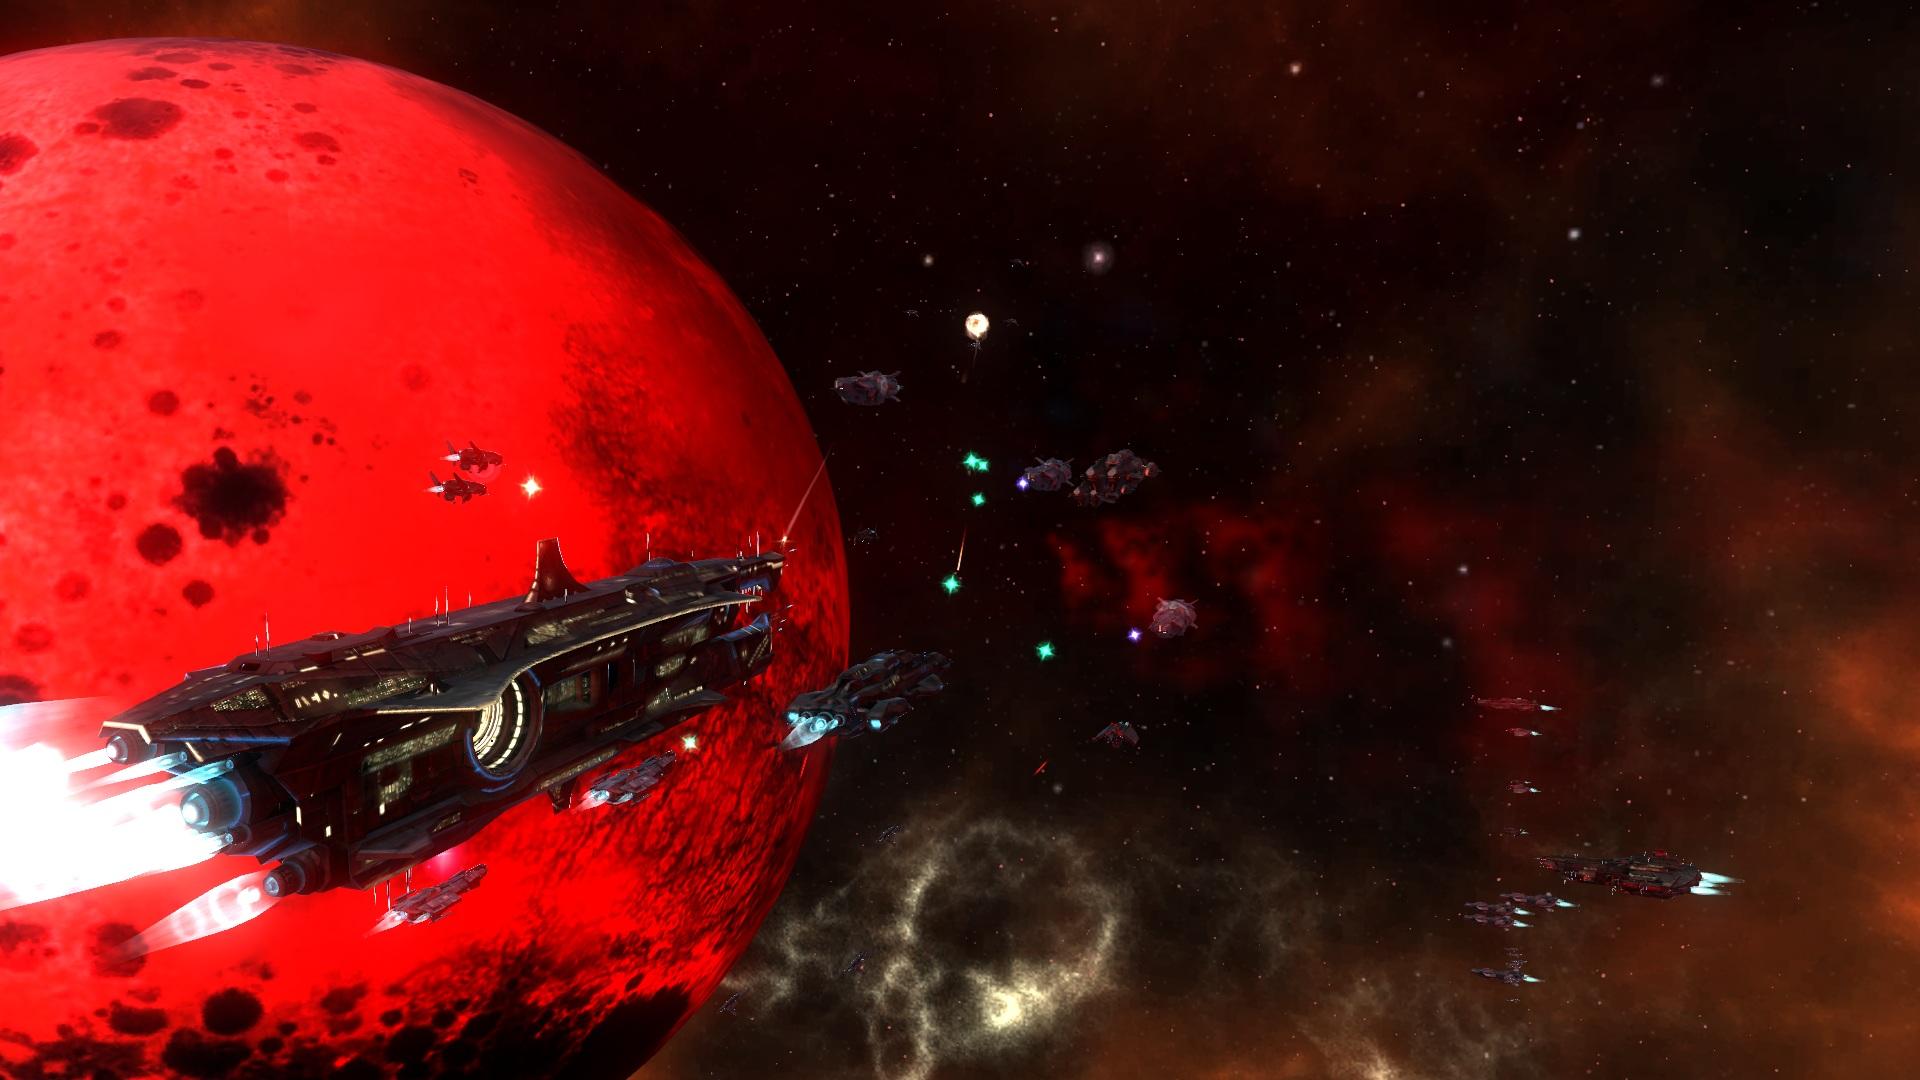 Mission: Genesis